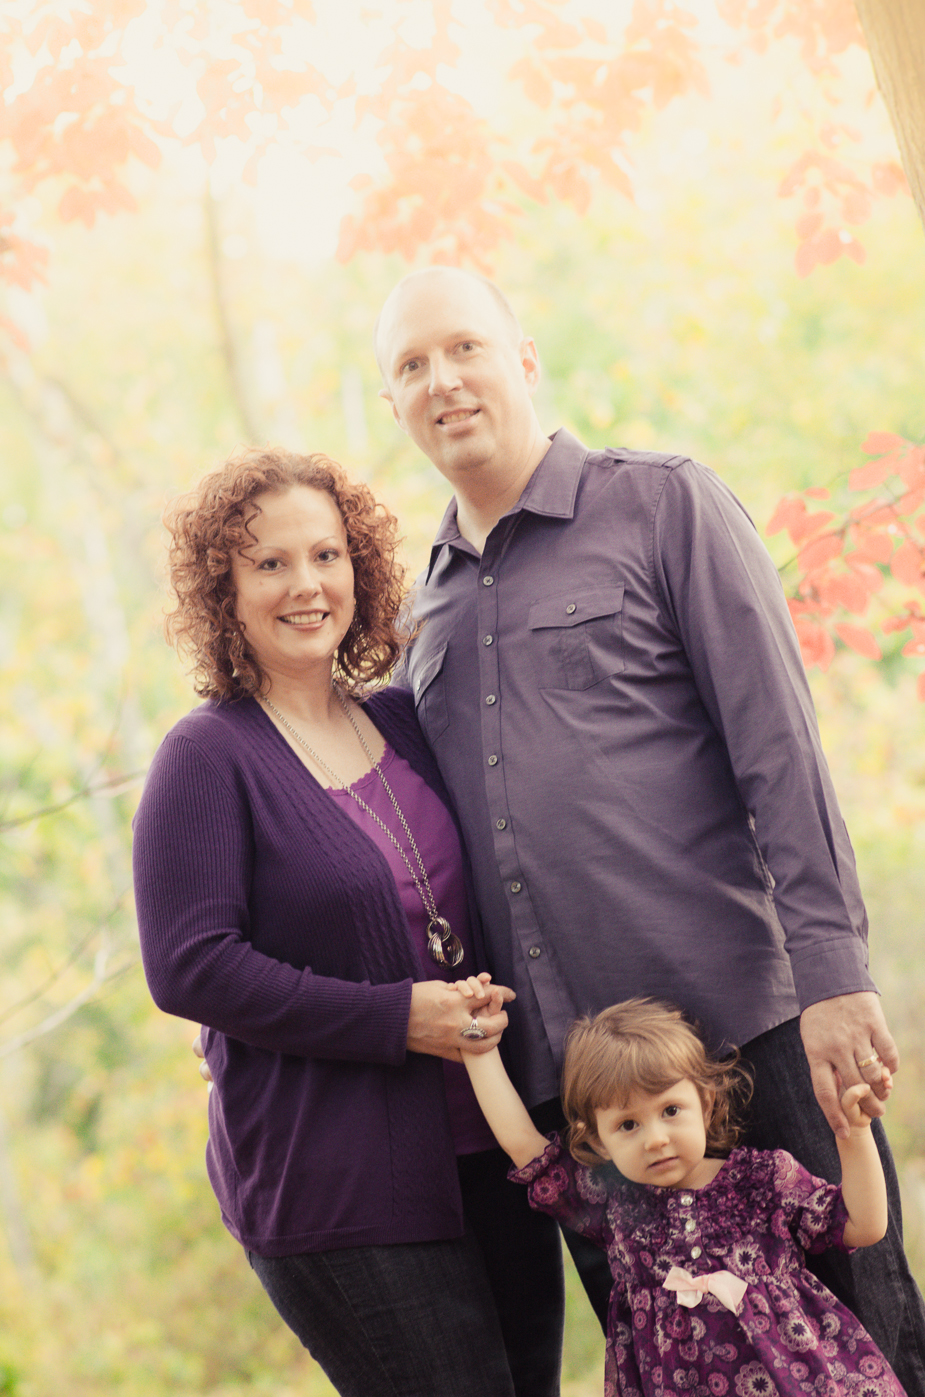 Family photo session Springfield Ohio